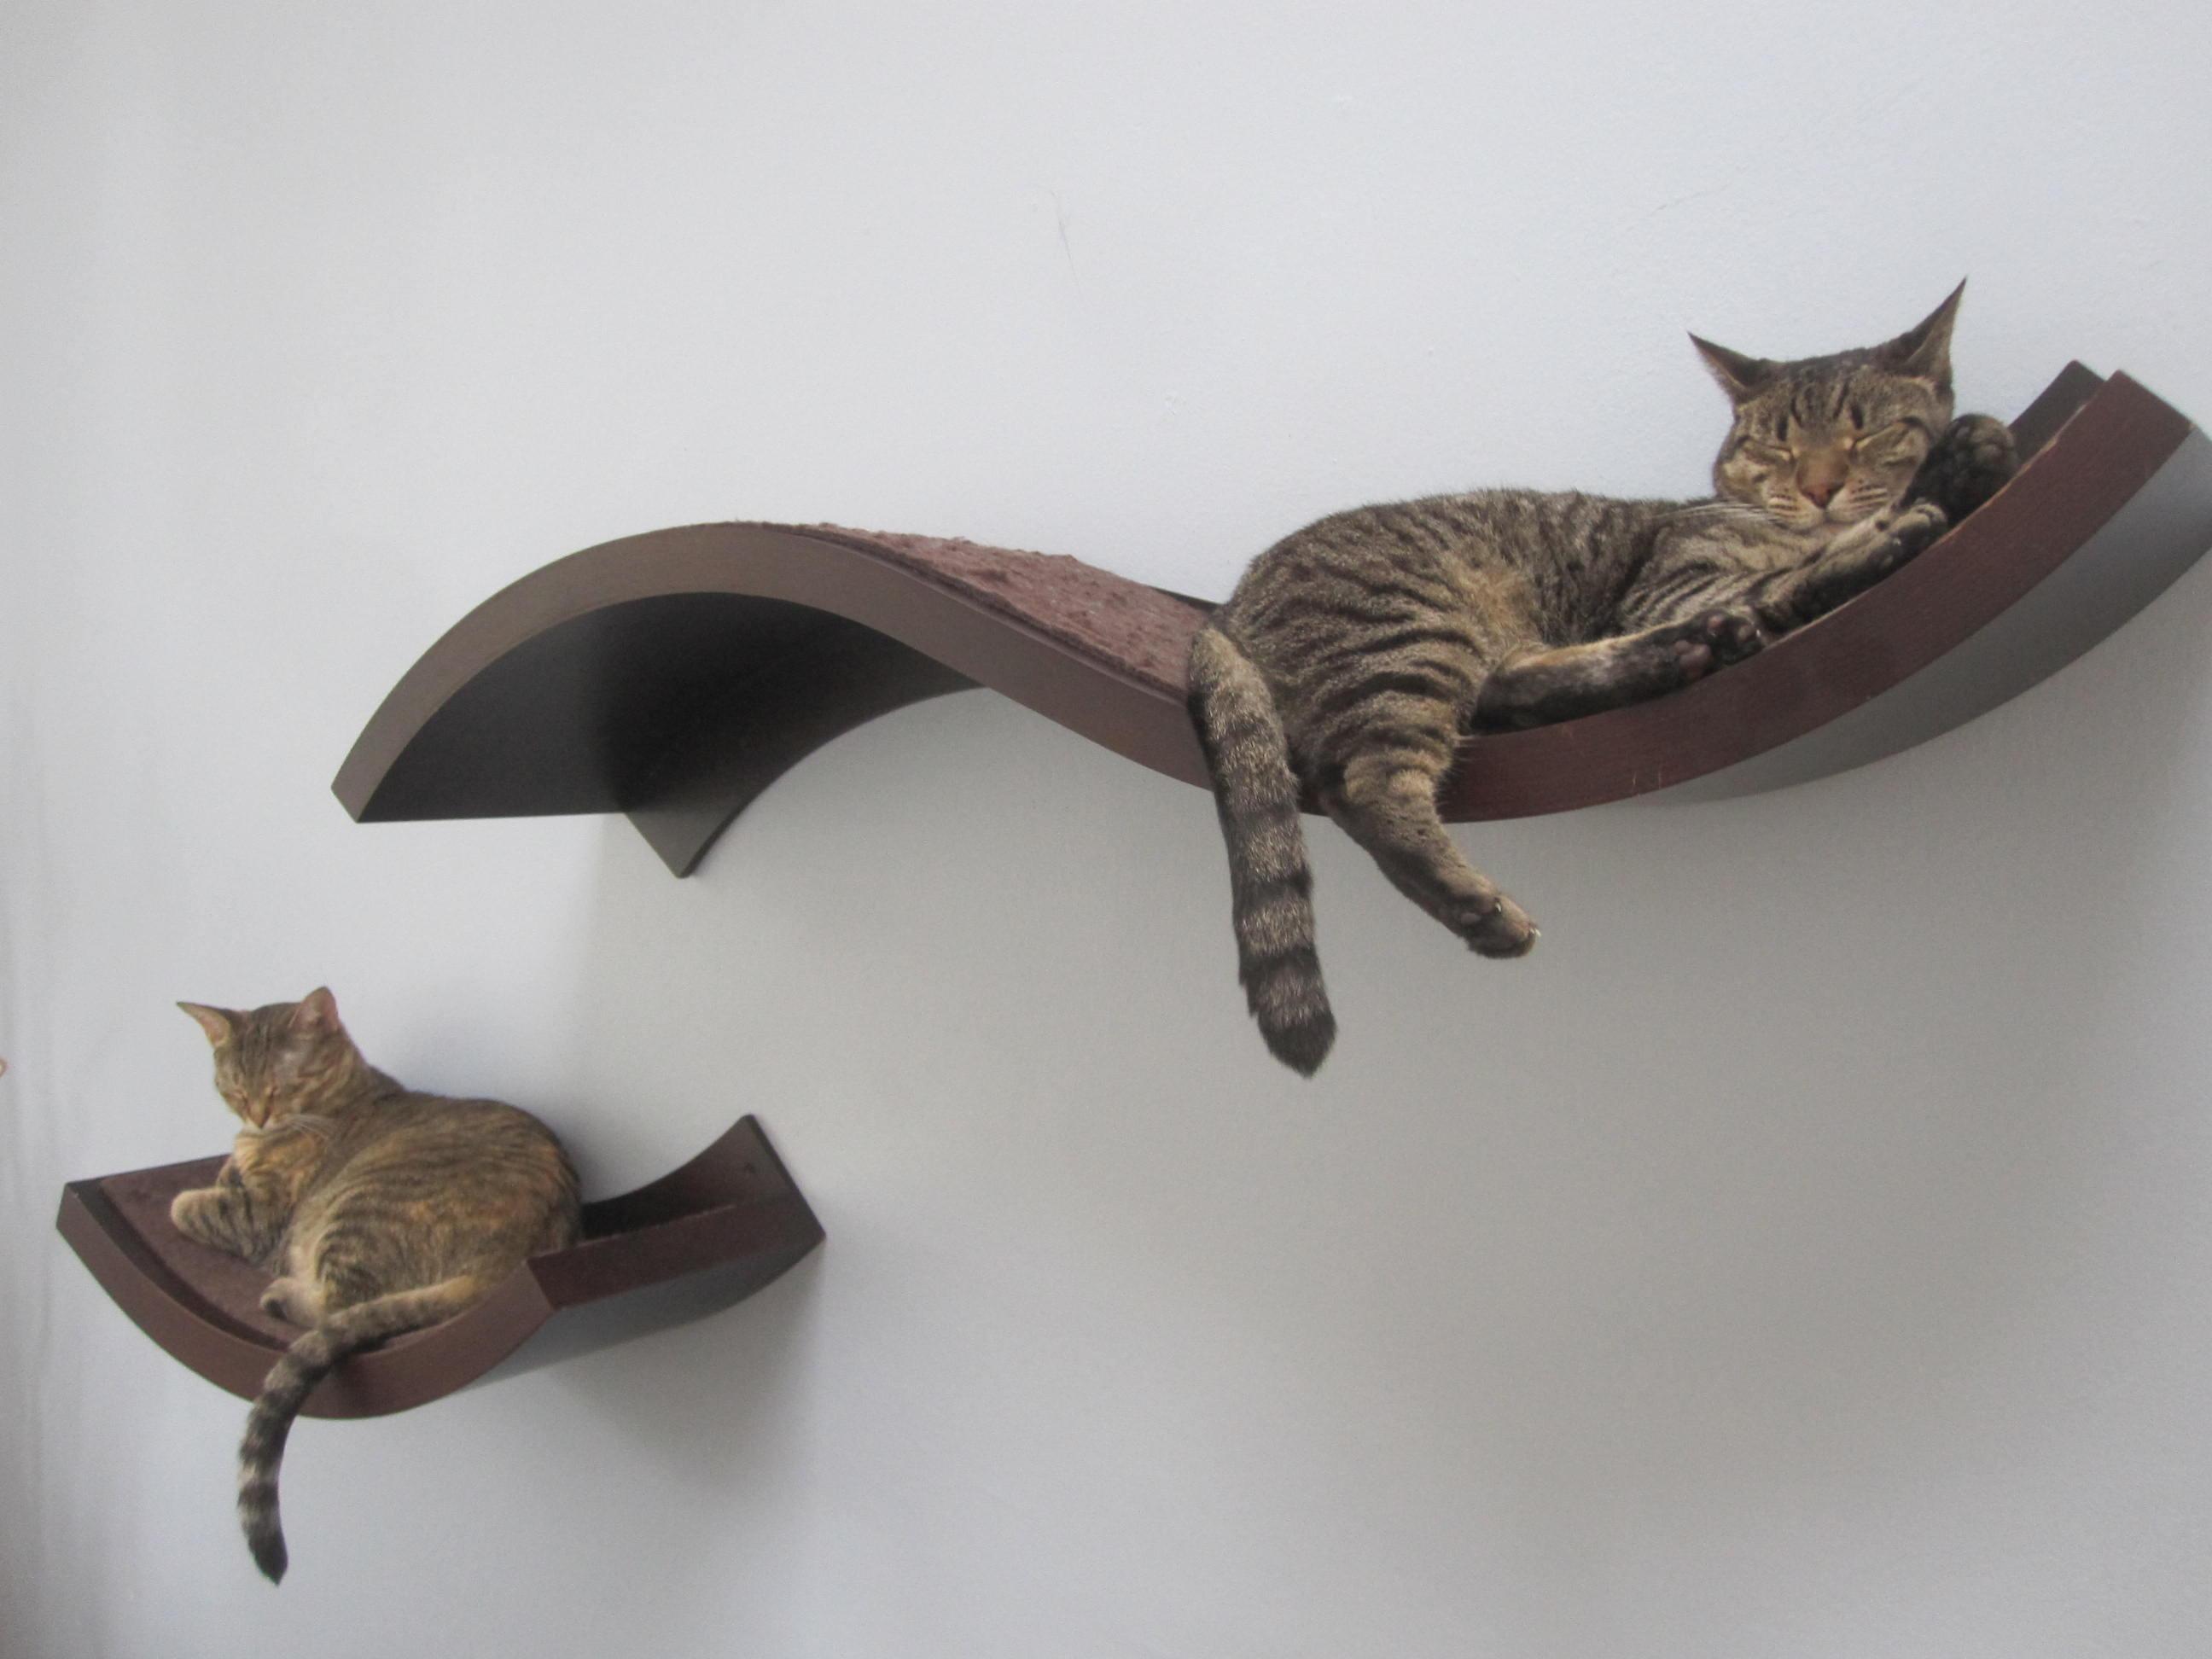 кот на полке cat on the shelf  № 1697926 бесплатно